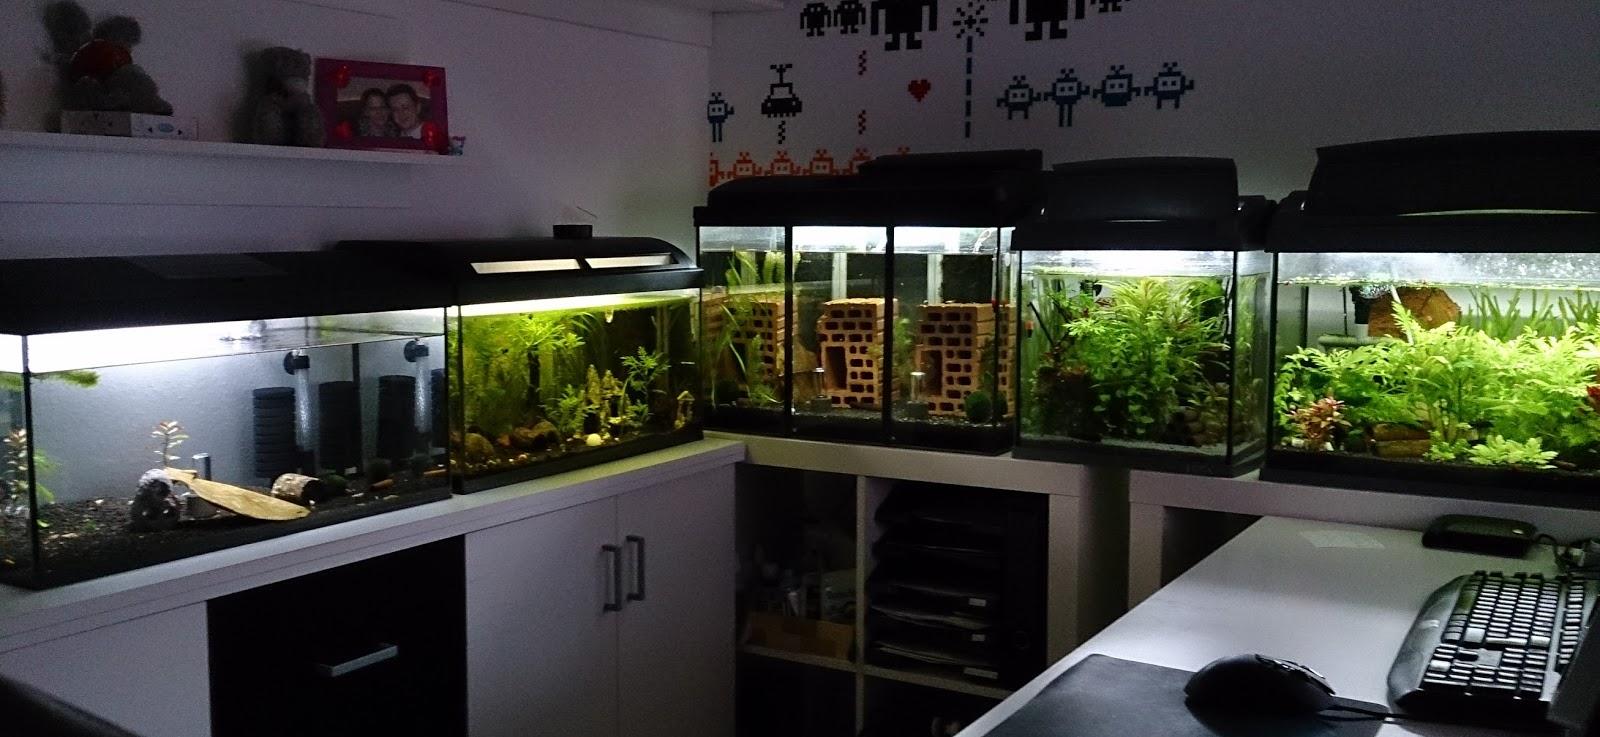 knuts garnelenblog aufbau der aquarienanlage. Black Bedroom Furniture Sets. Home Design Ideas